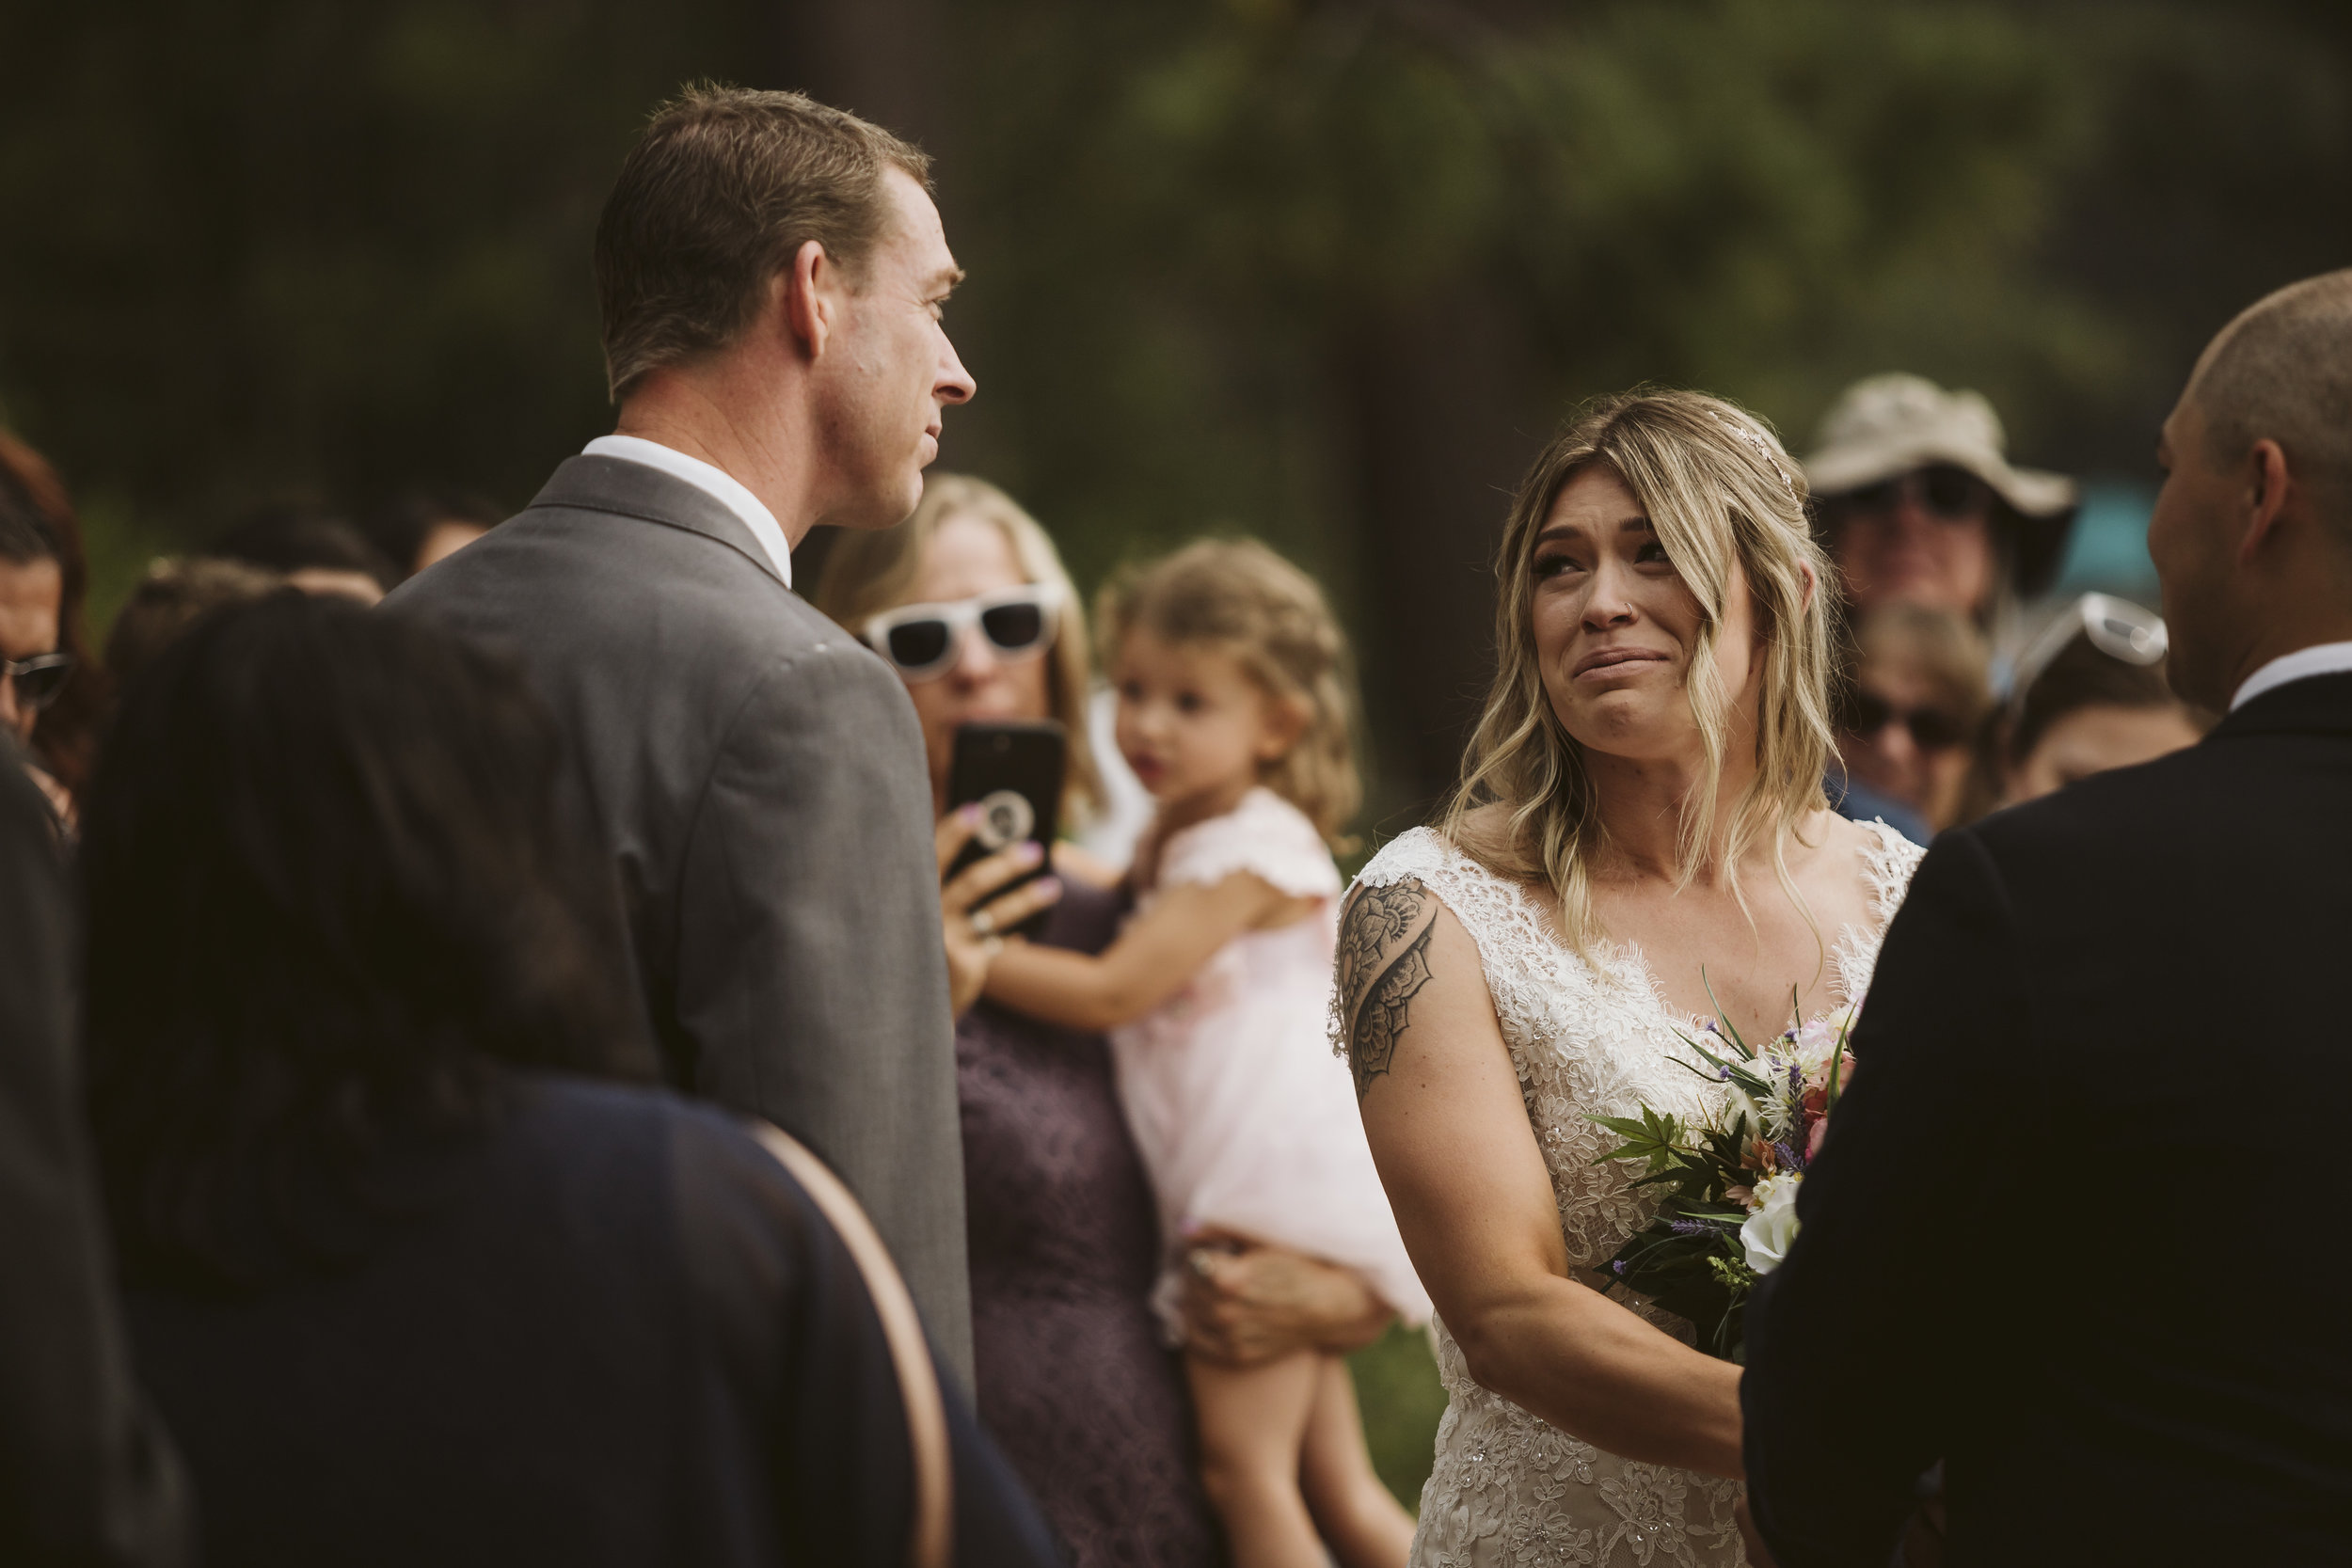 _MG_9631vild-vild photography-photography-wedding-wedding photography-tahoe-lake tahoe-lake tahoe wedding photographer-nevada wedding photographer-mountain wedding.jpg